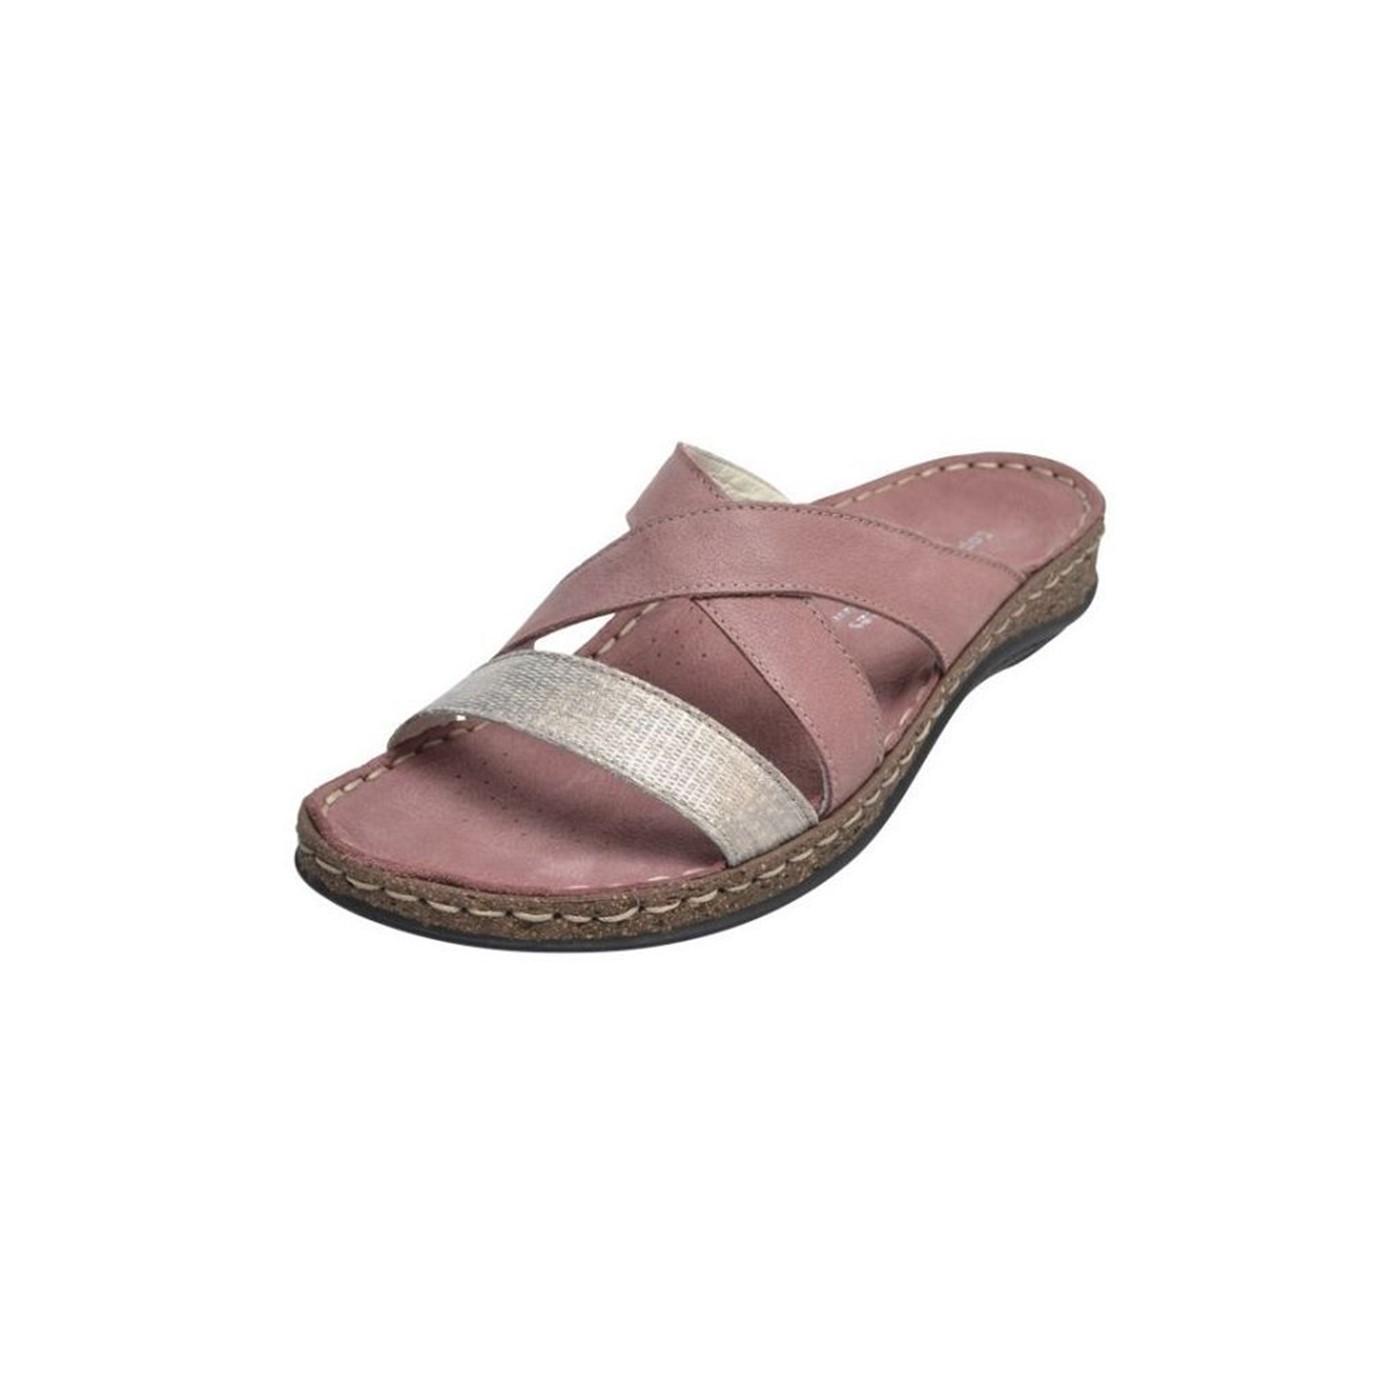 255a110fd124 Copenhagen shoes 2016 Astrid (multi-cs1568)